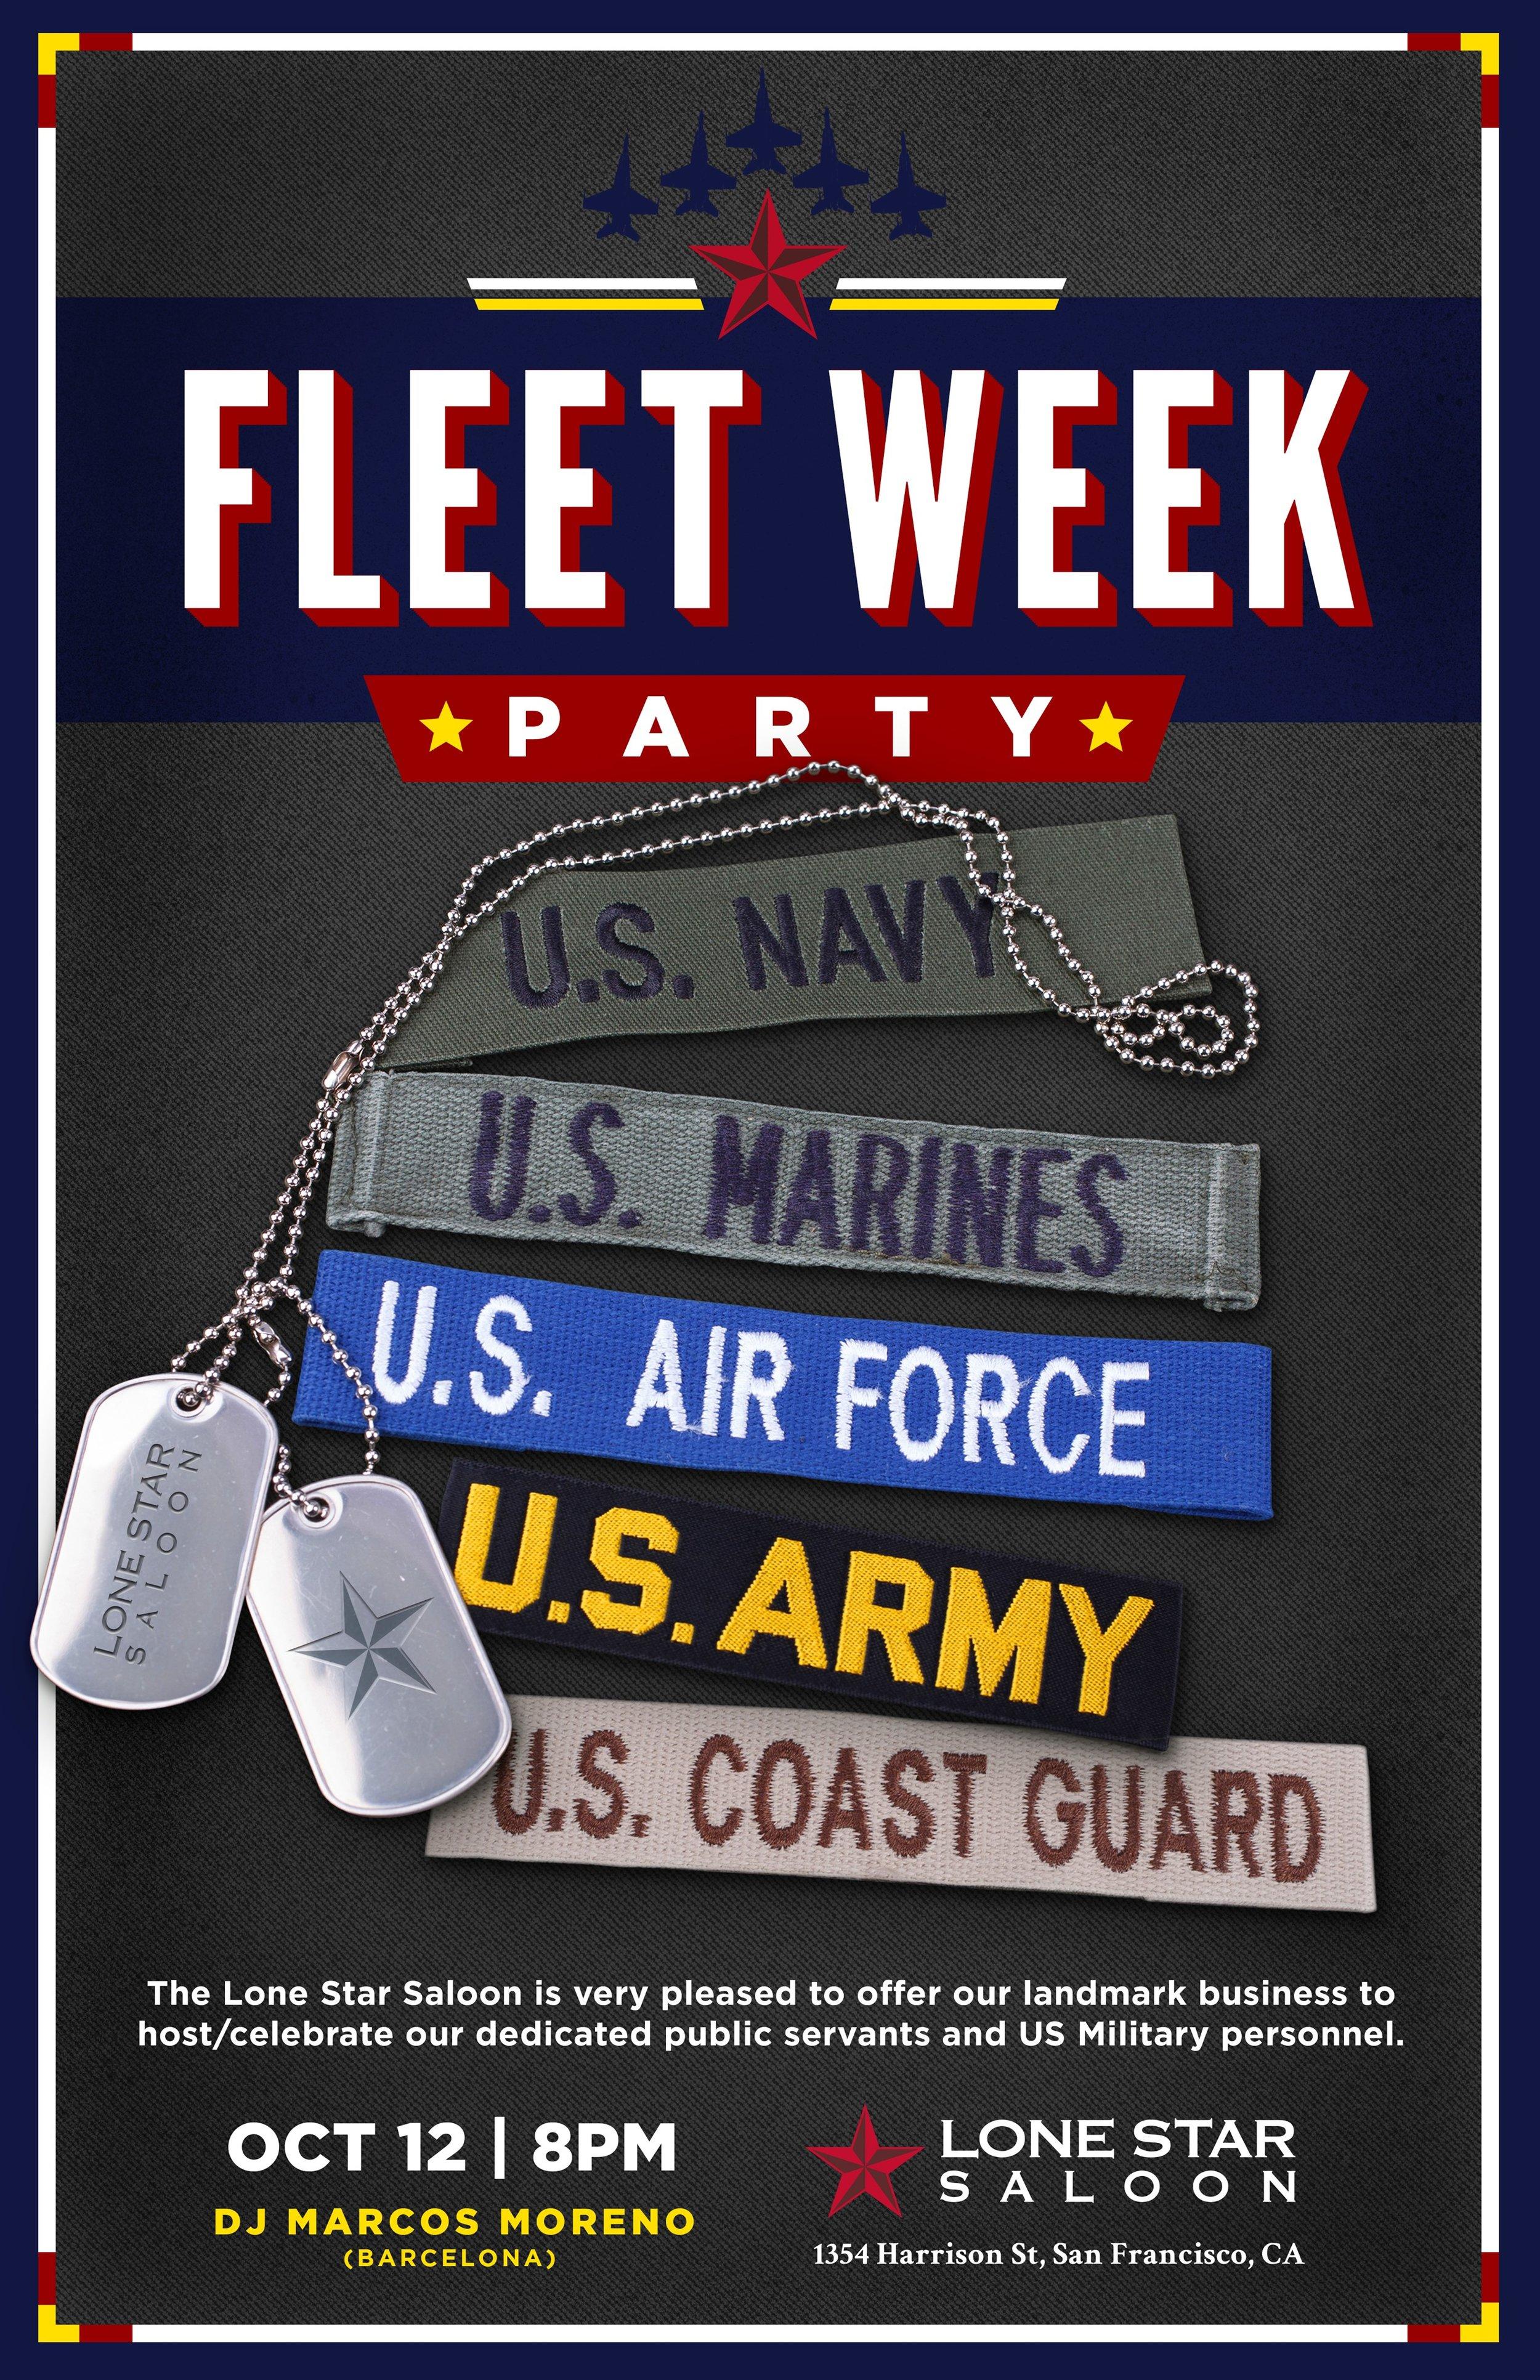 Fleet week.jpg